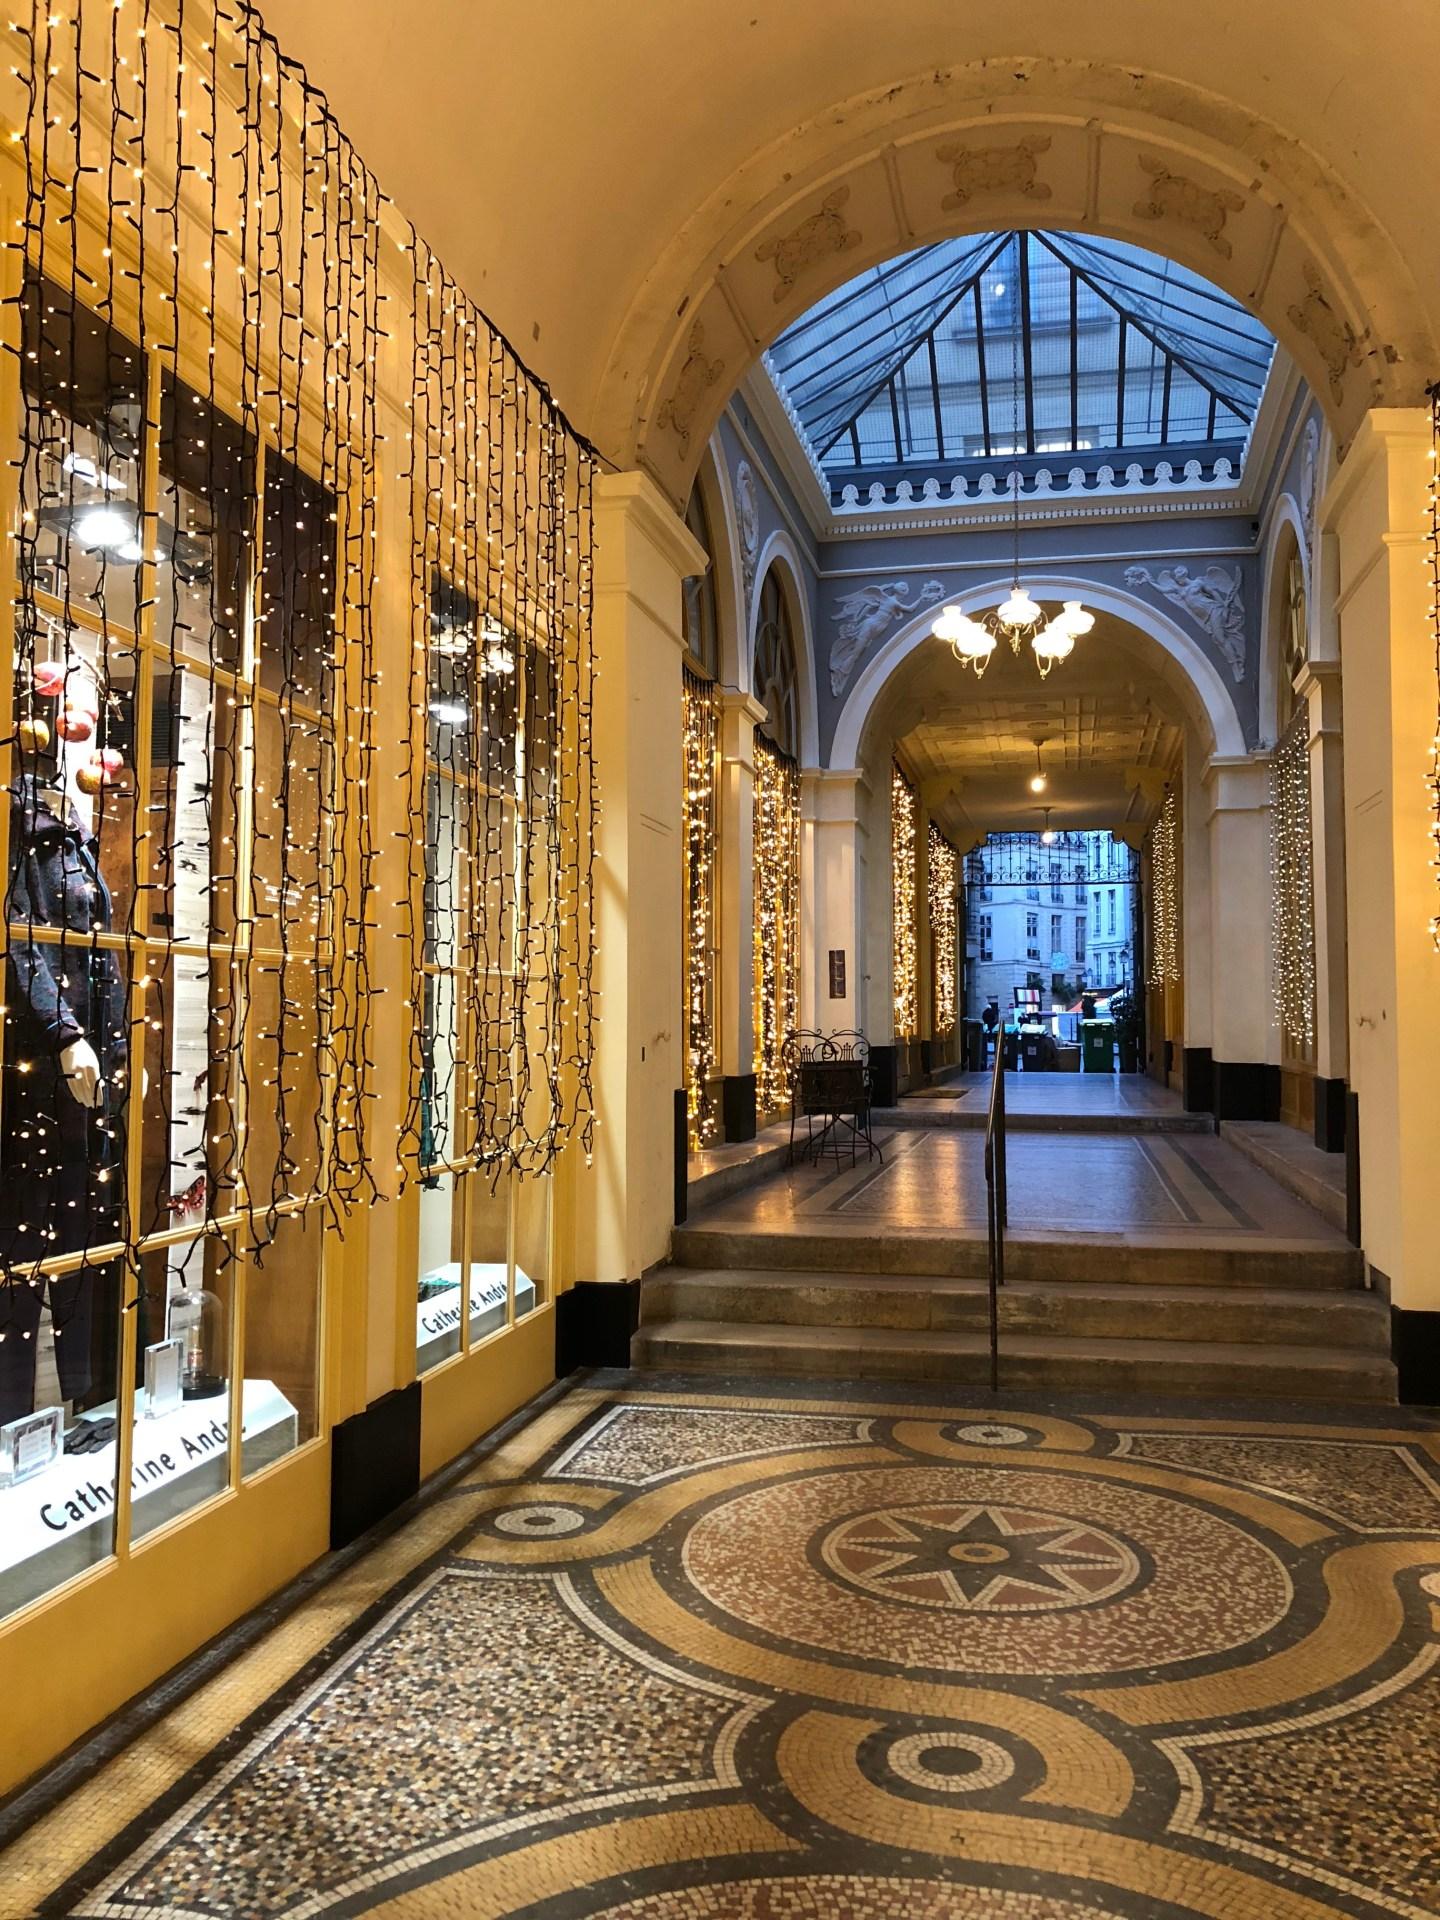 Galerie Vivienne Christmas Lights